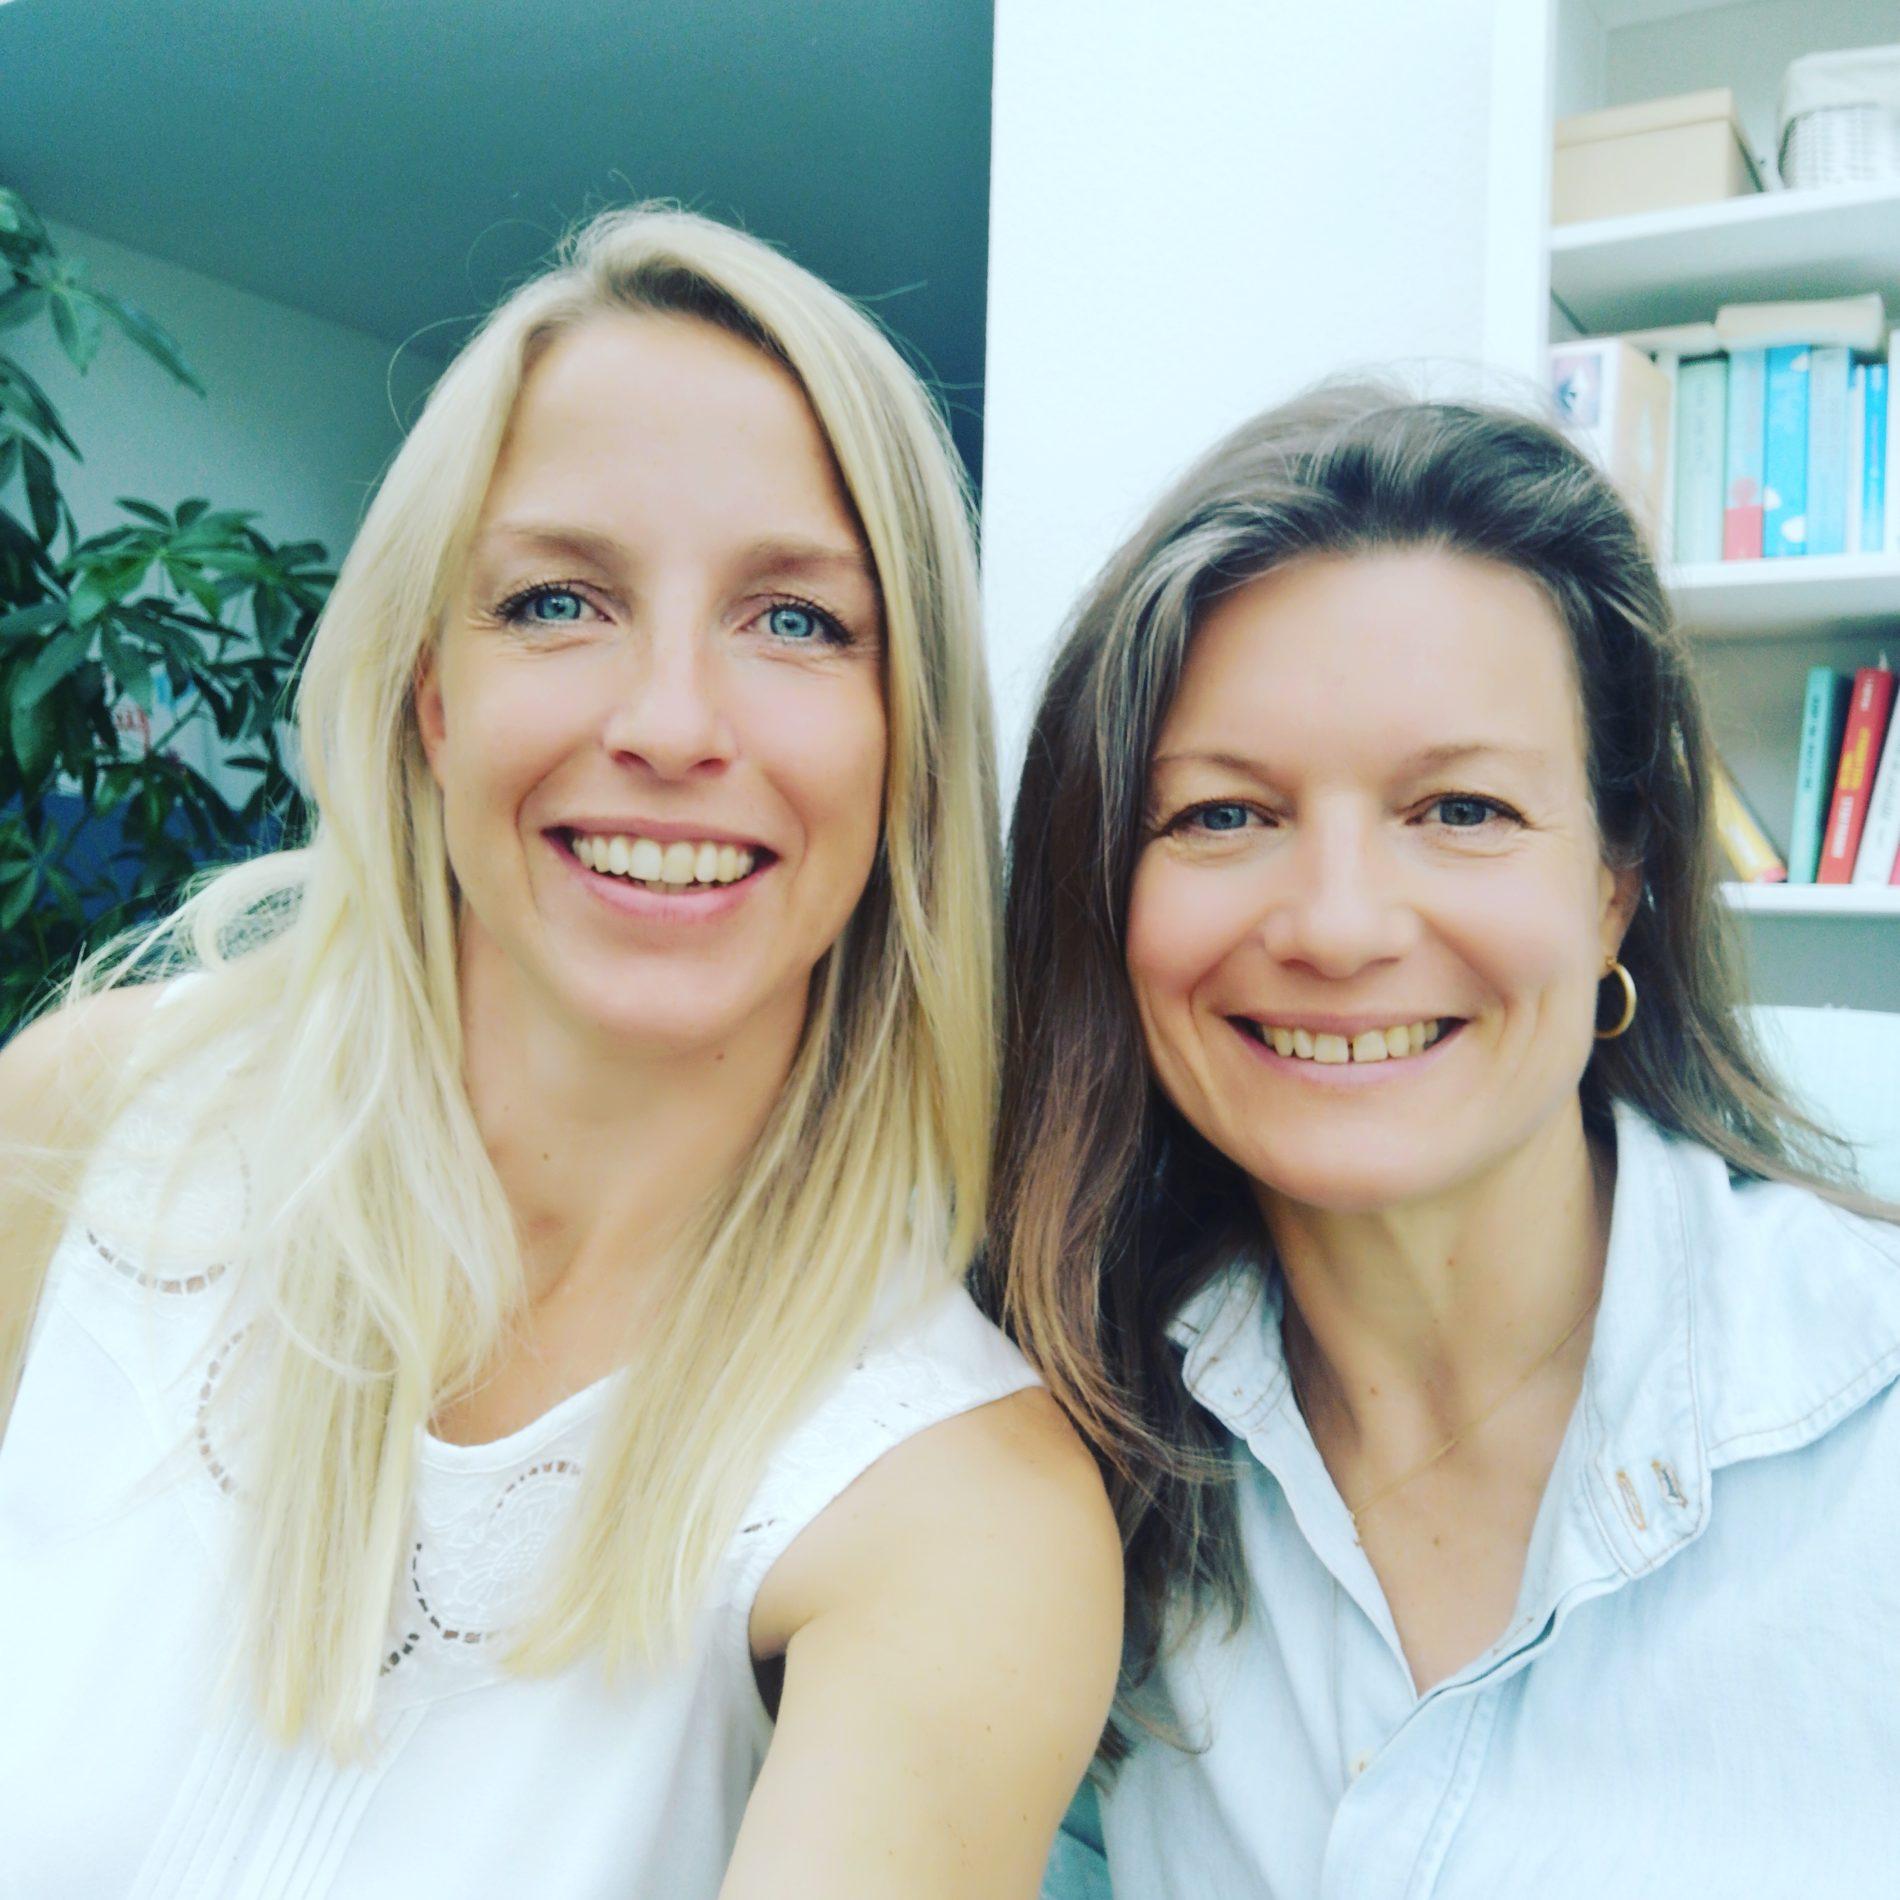 Podcastinterview Eva Maria Klinger Yvonne Birkel